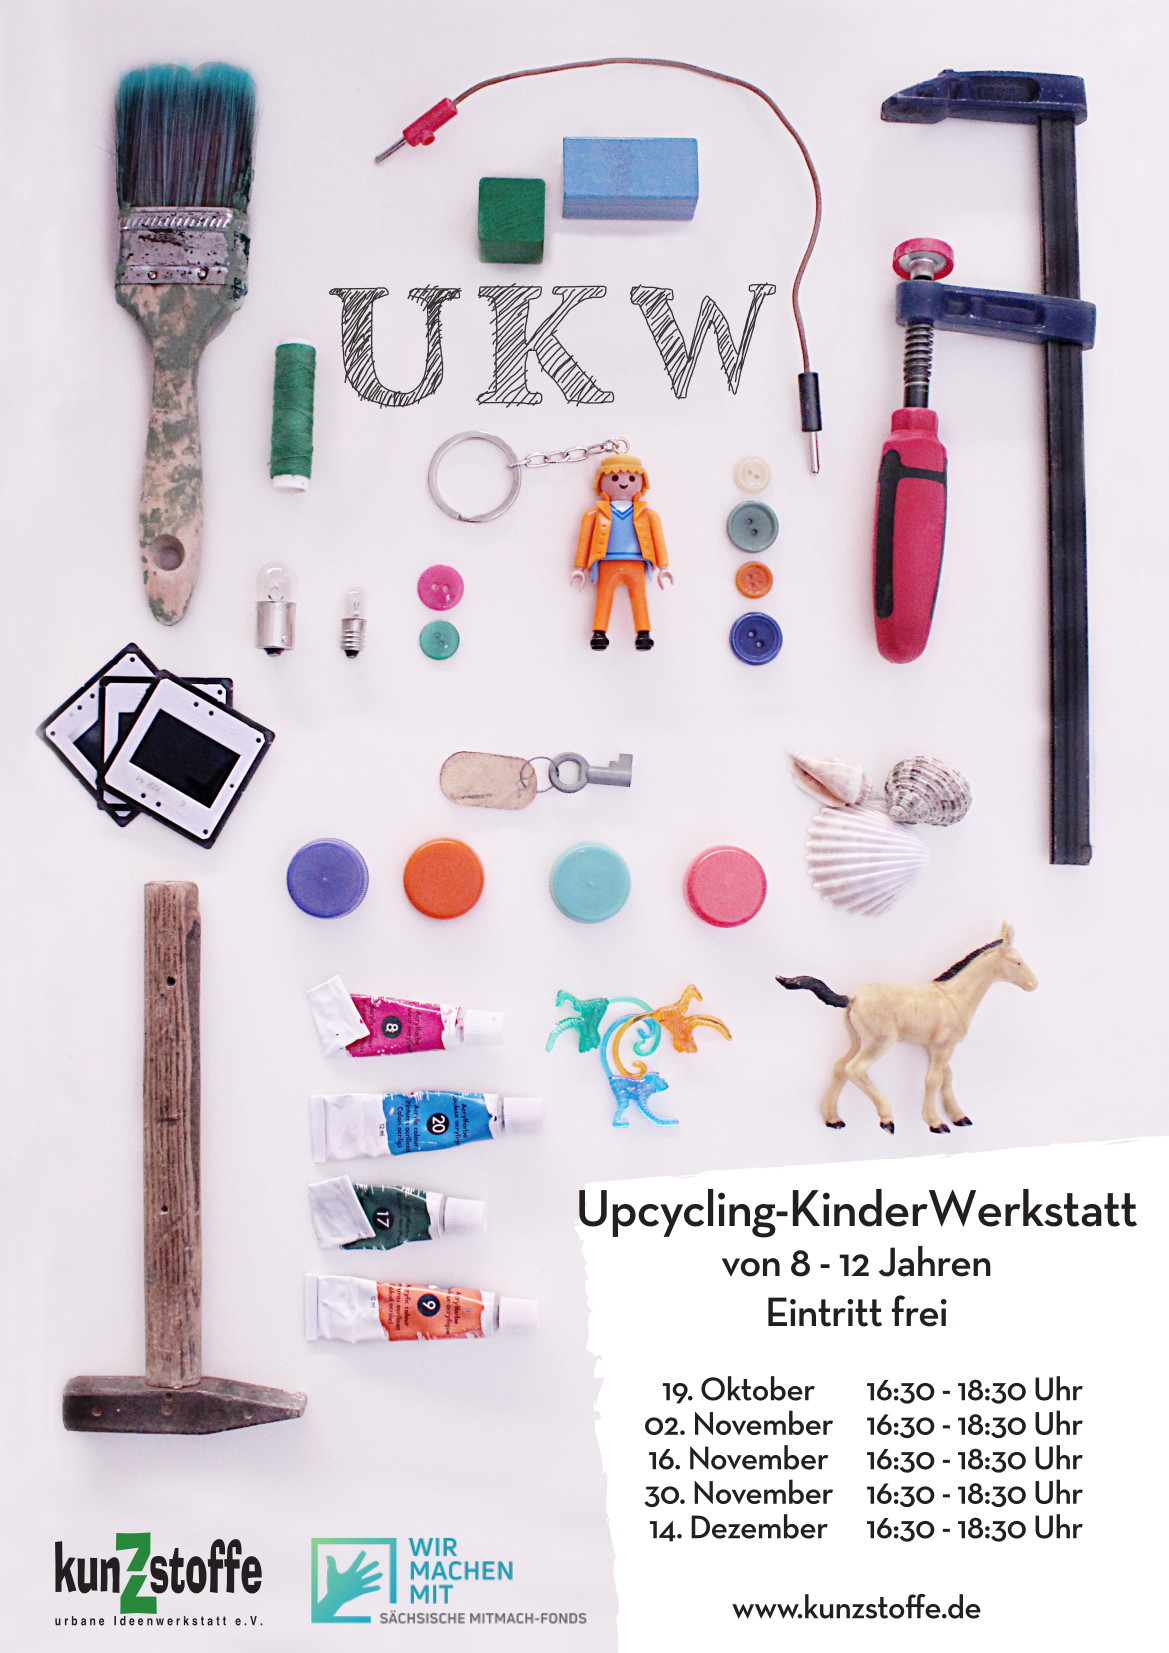 UKW – Upcycling KinderWerkstatt – Fällt leider aus